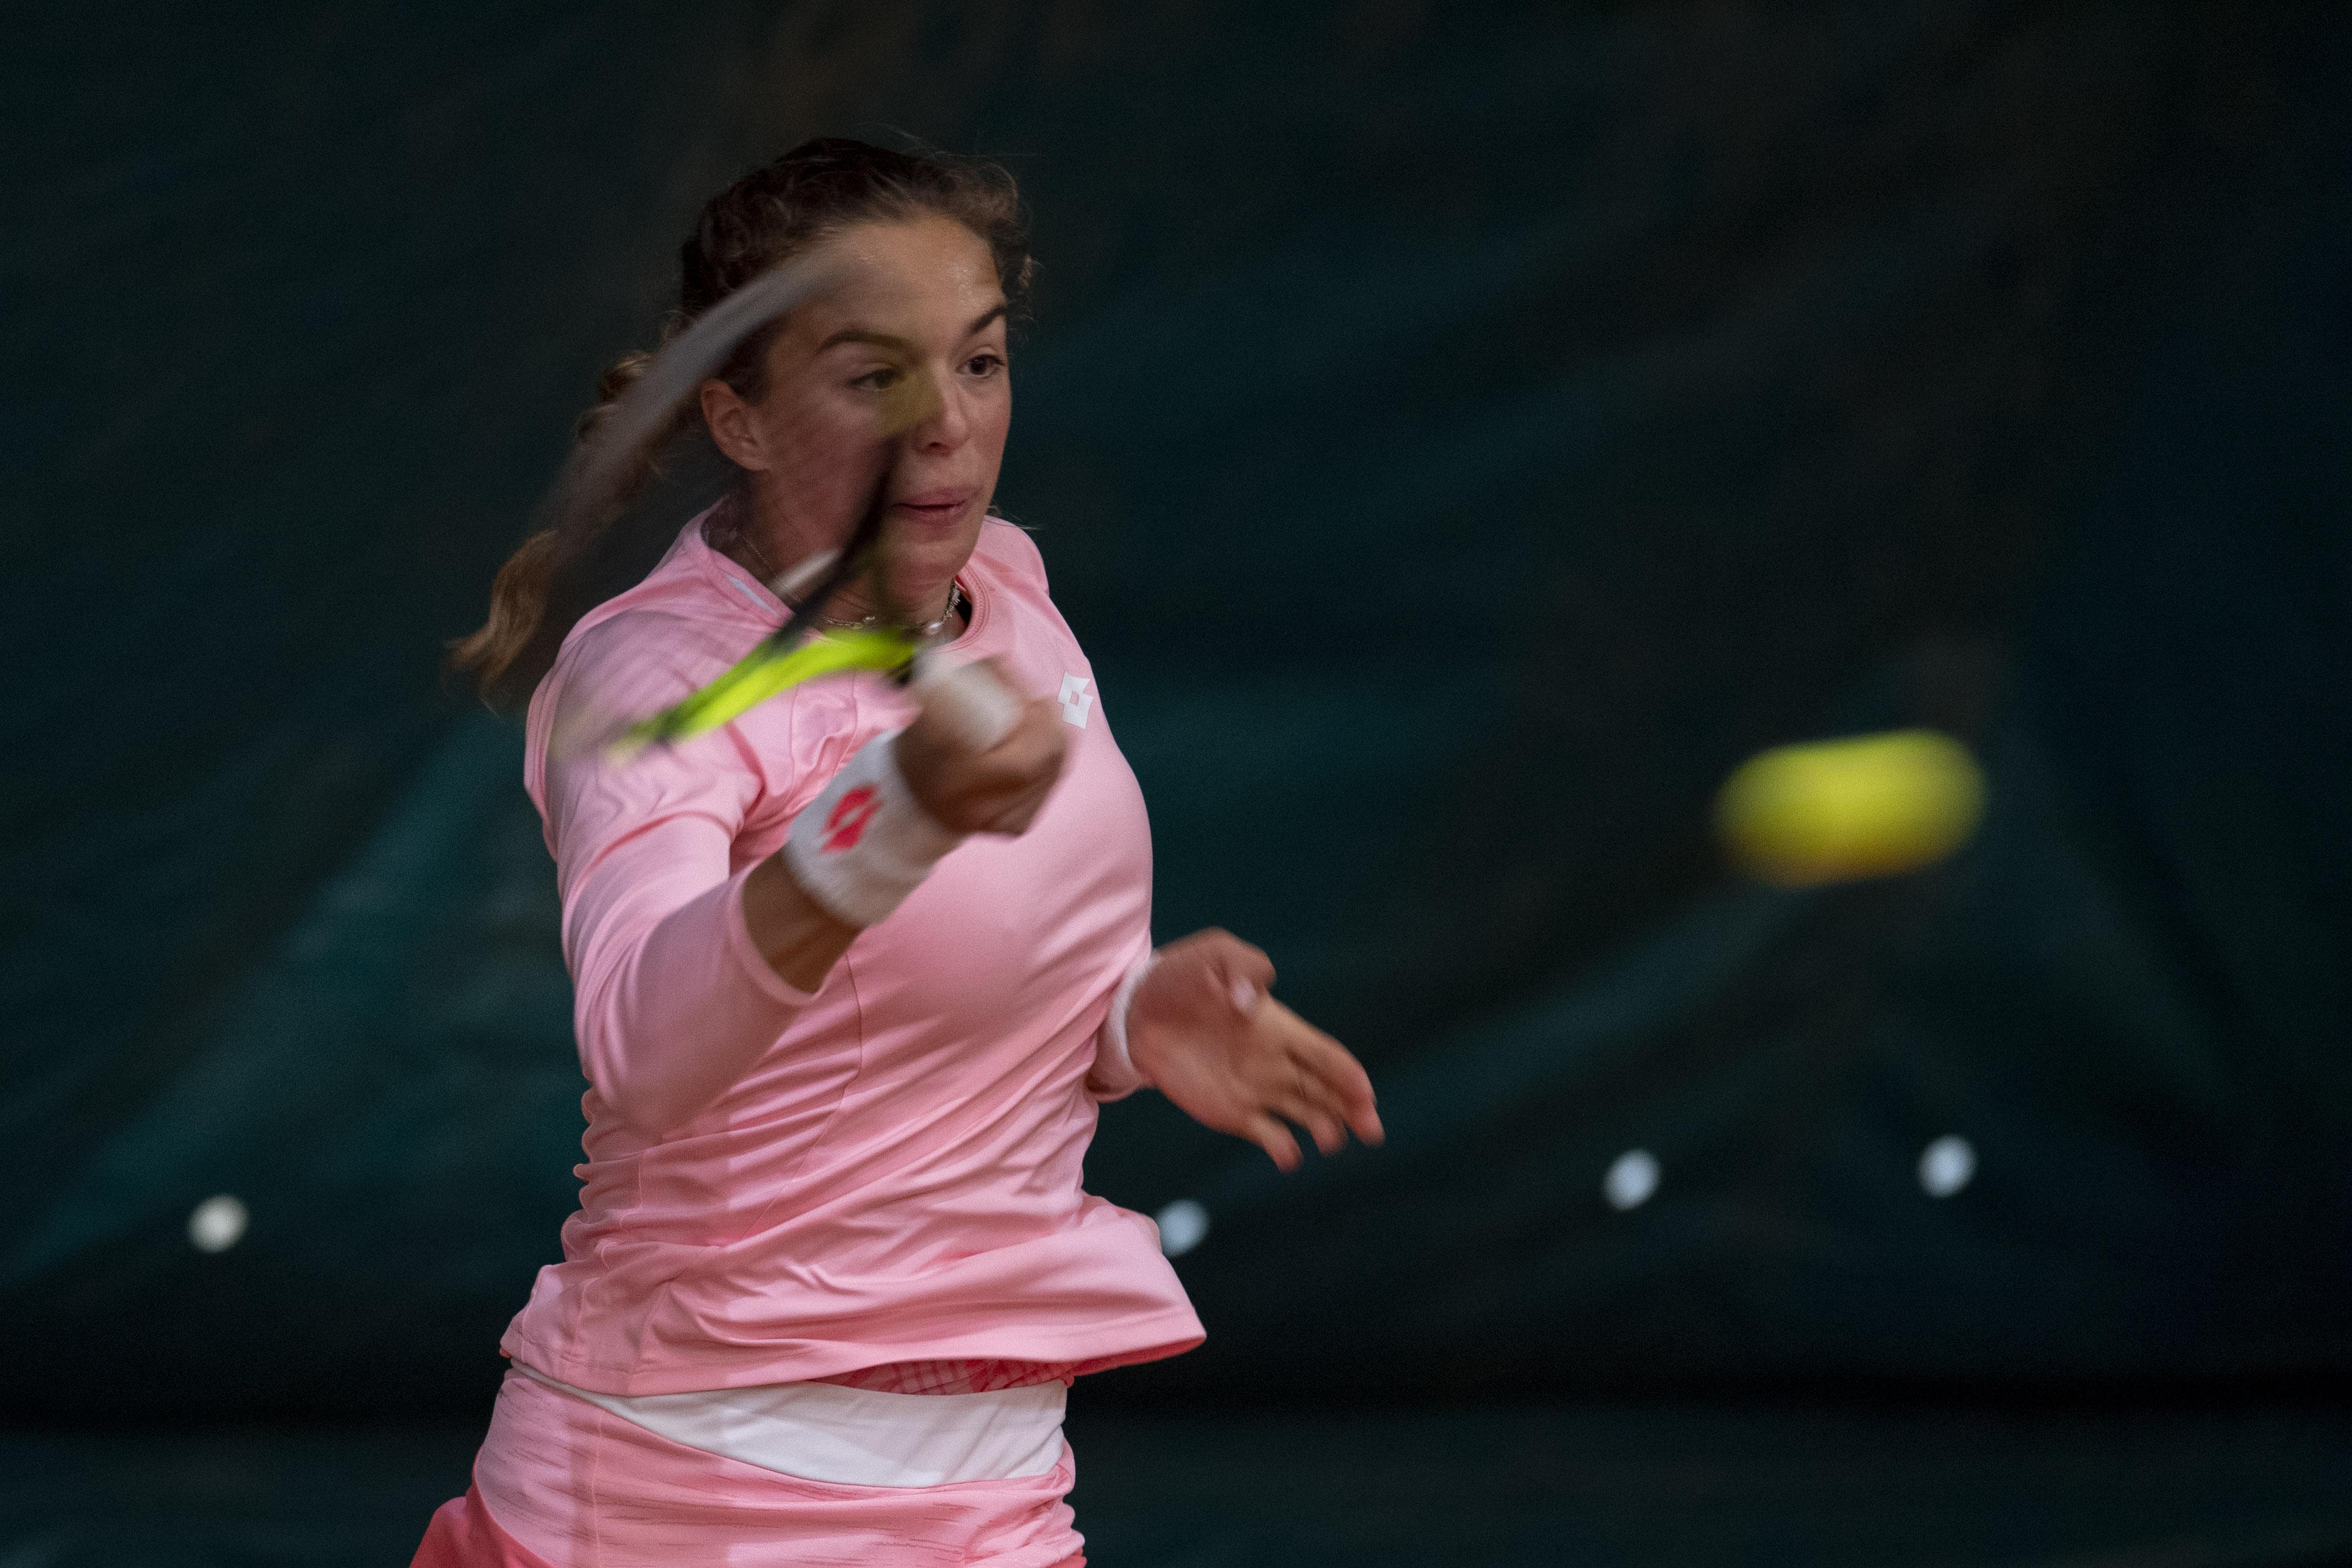 2021.04.11-ITF-WorldTennisTour-Final-Lucia-Bronzetti-ITA-01